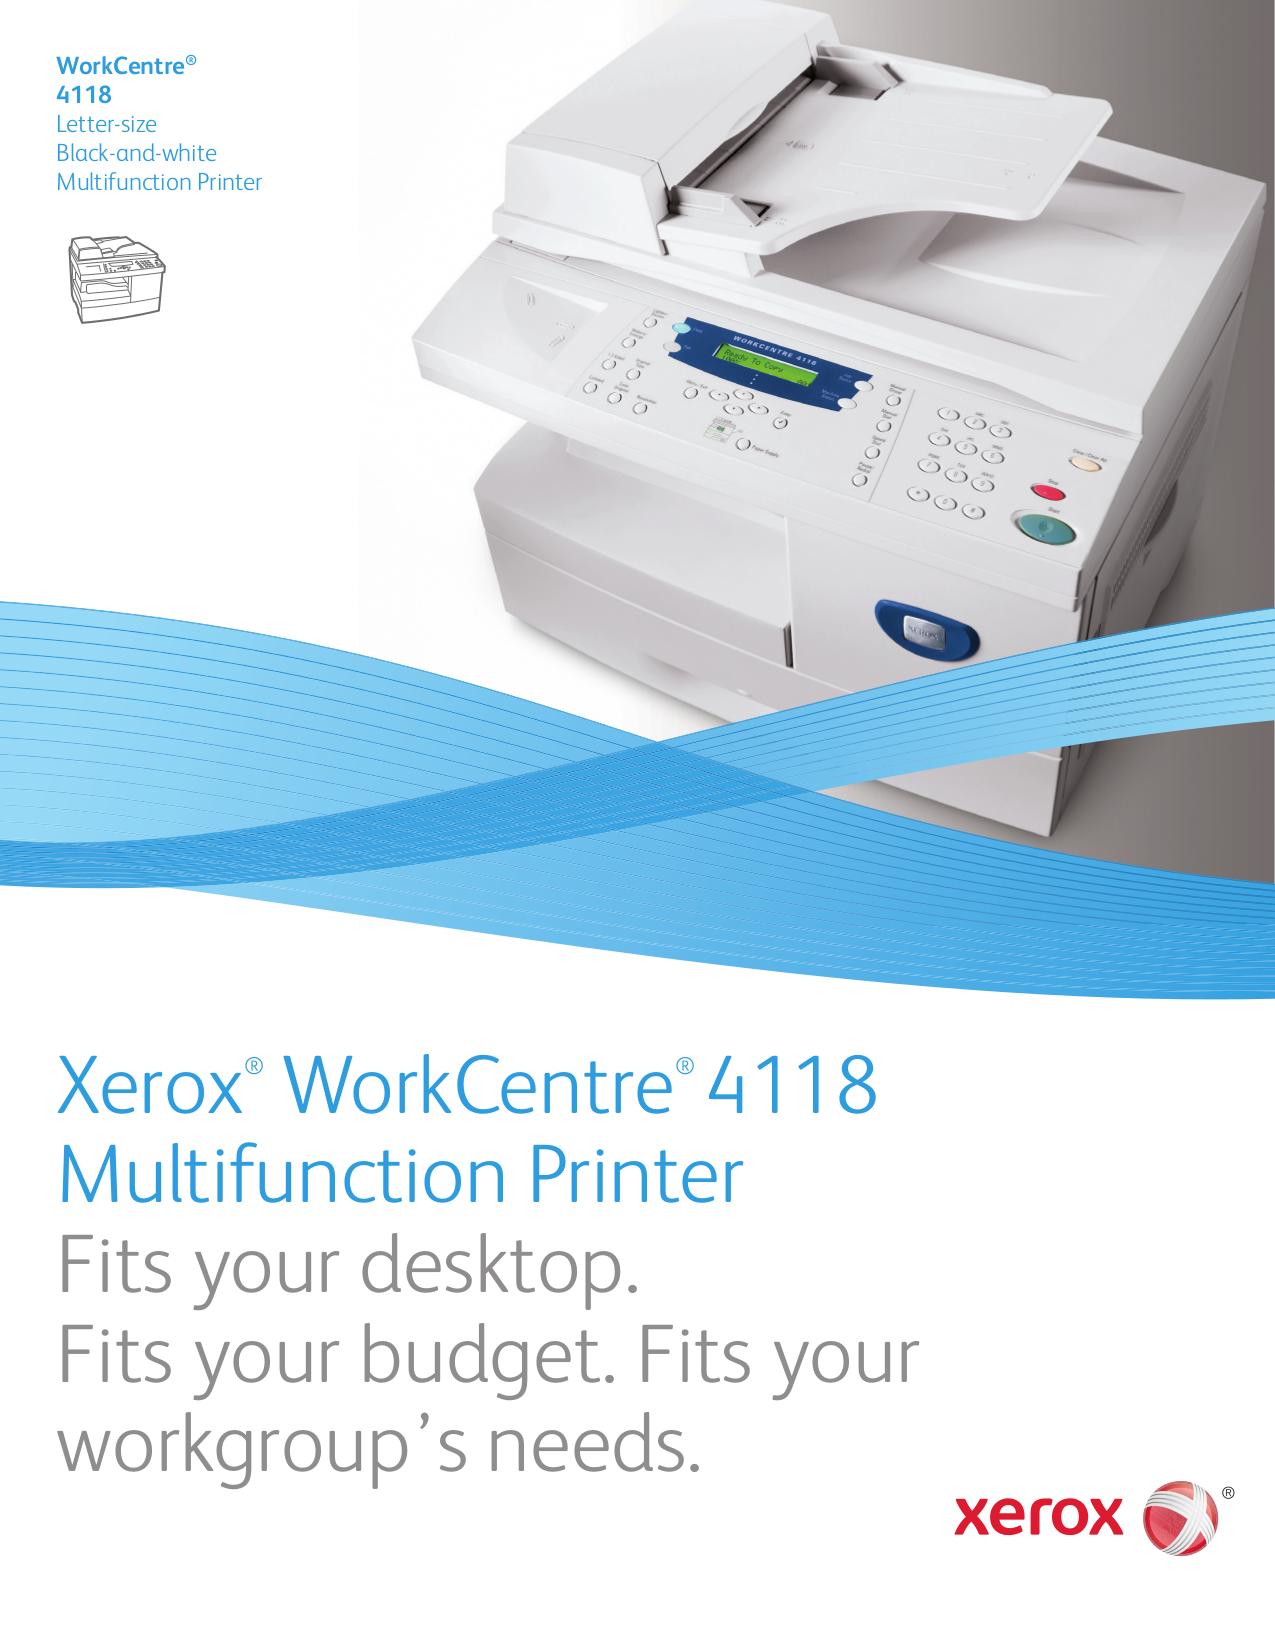 download free pdf for xerox workcentre 4118 multifunction printer manual rh umlib com xerox workcentre 4118 manual de servicio xerox workcentre 4118 service manual